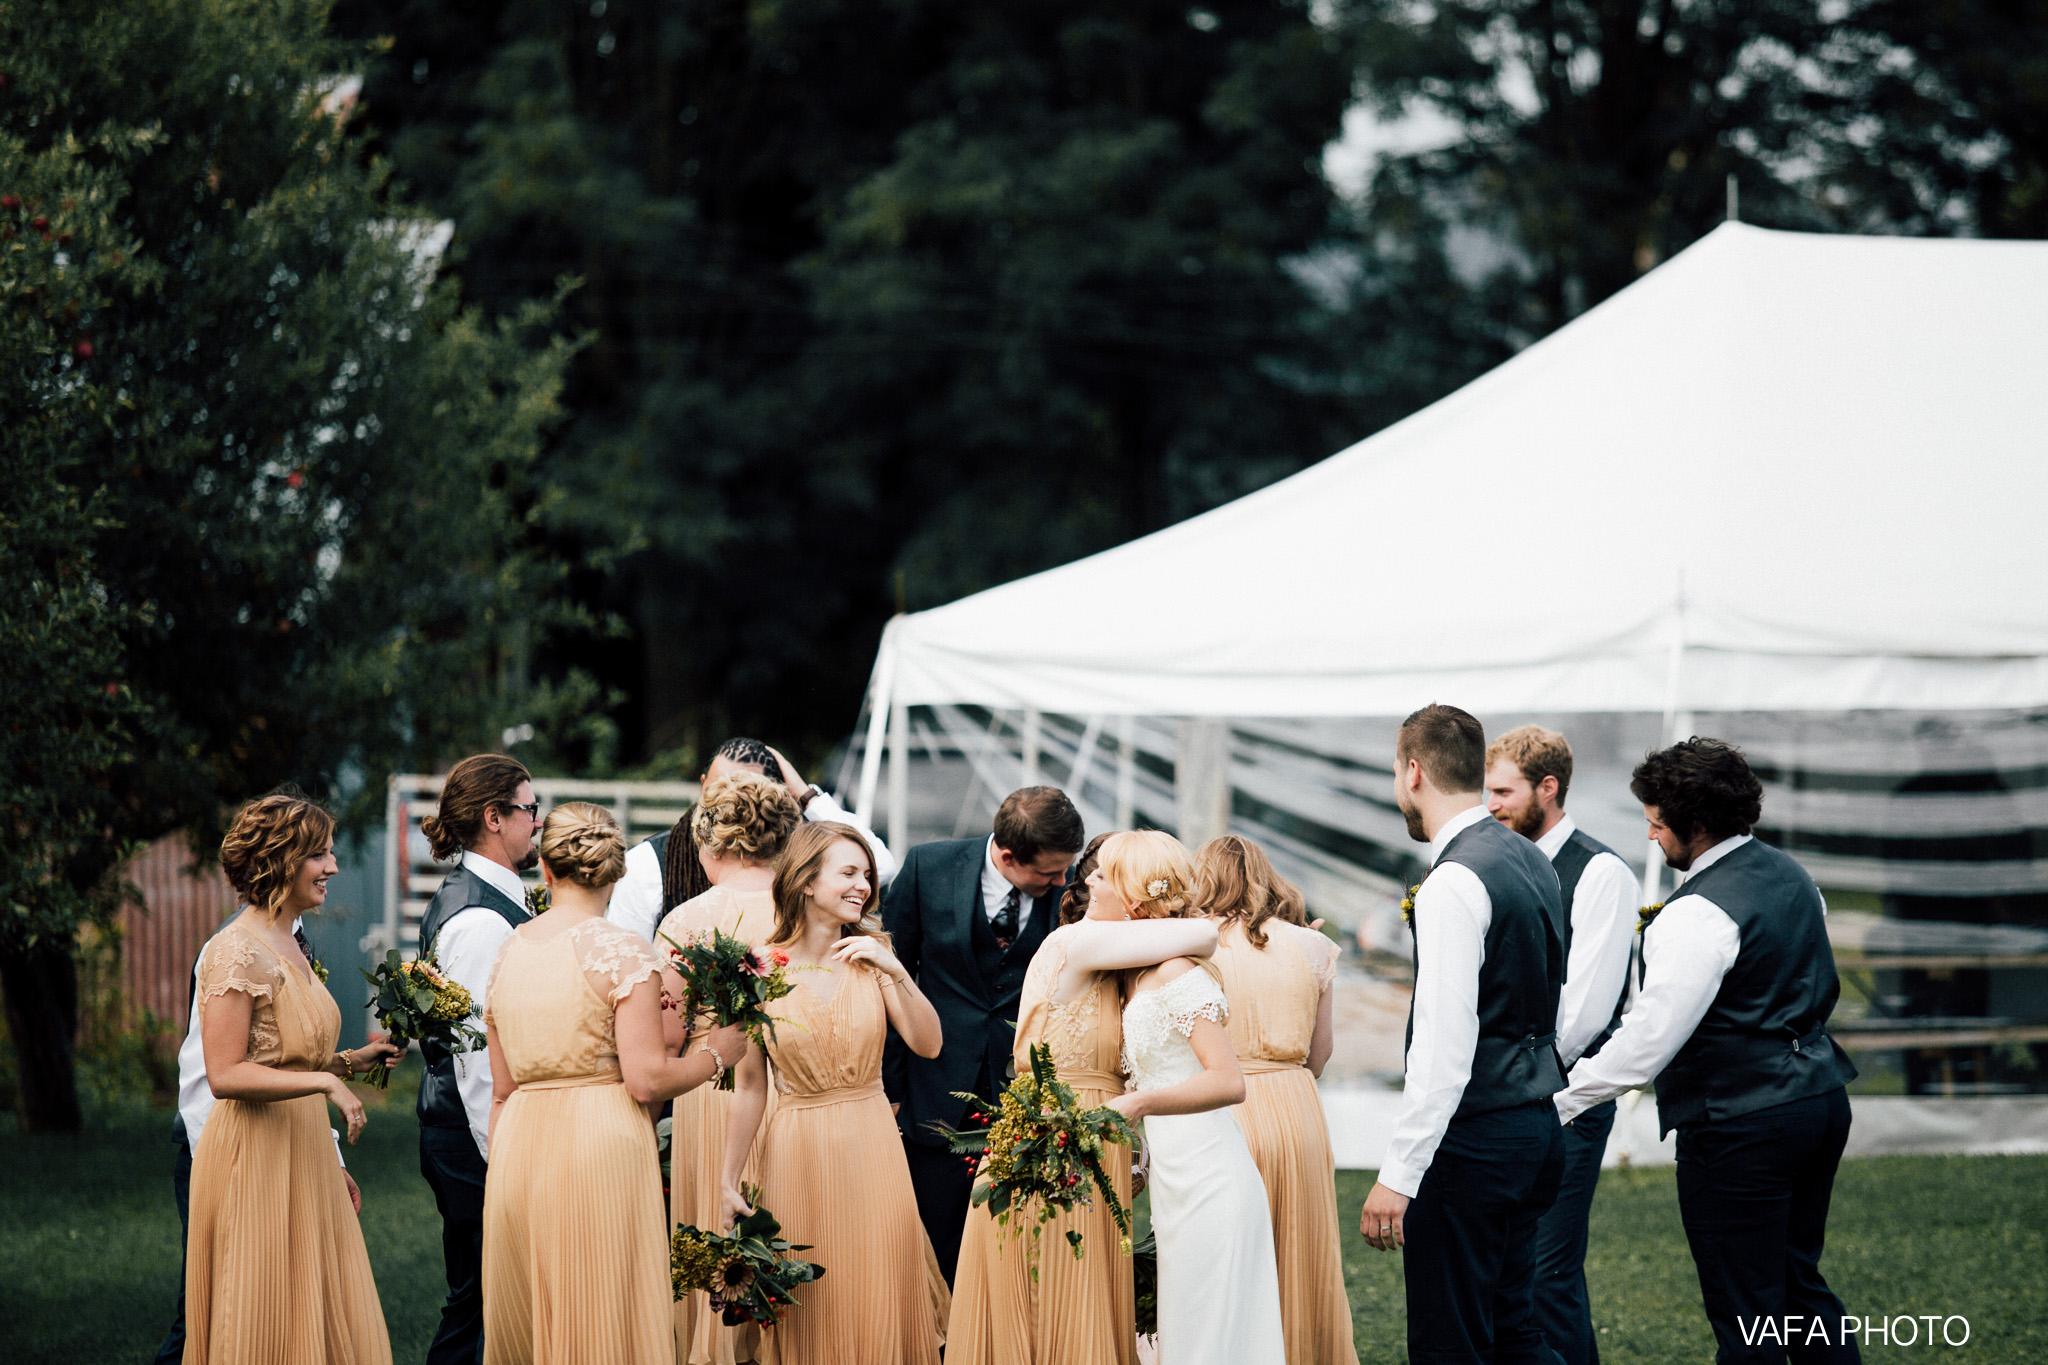 Belsolda-Farm-Wedding-Christy-Eric-Vafa-Photo-508.jpg